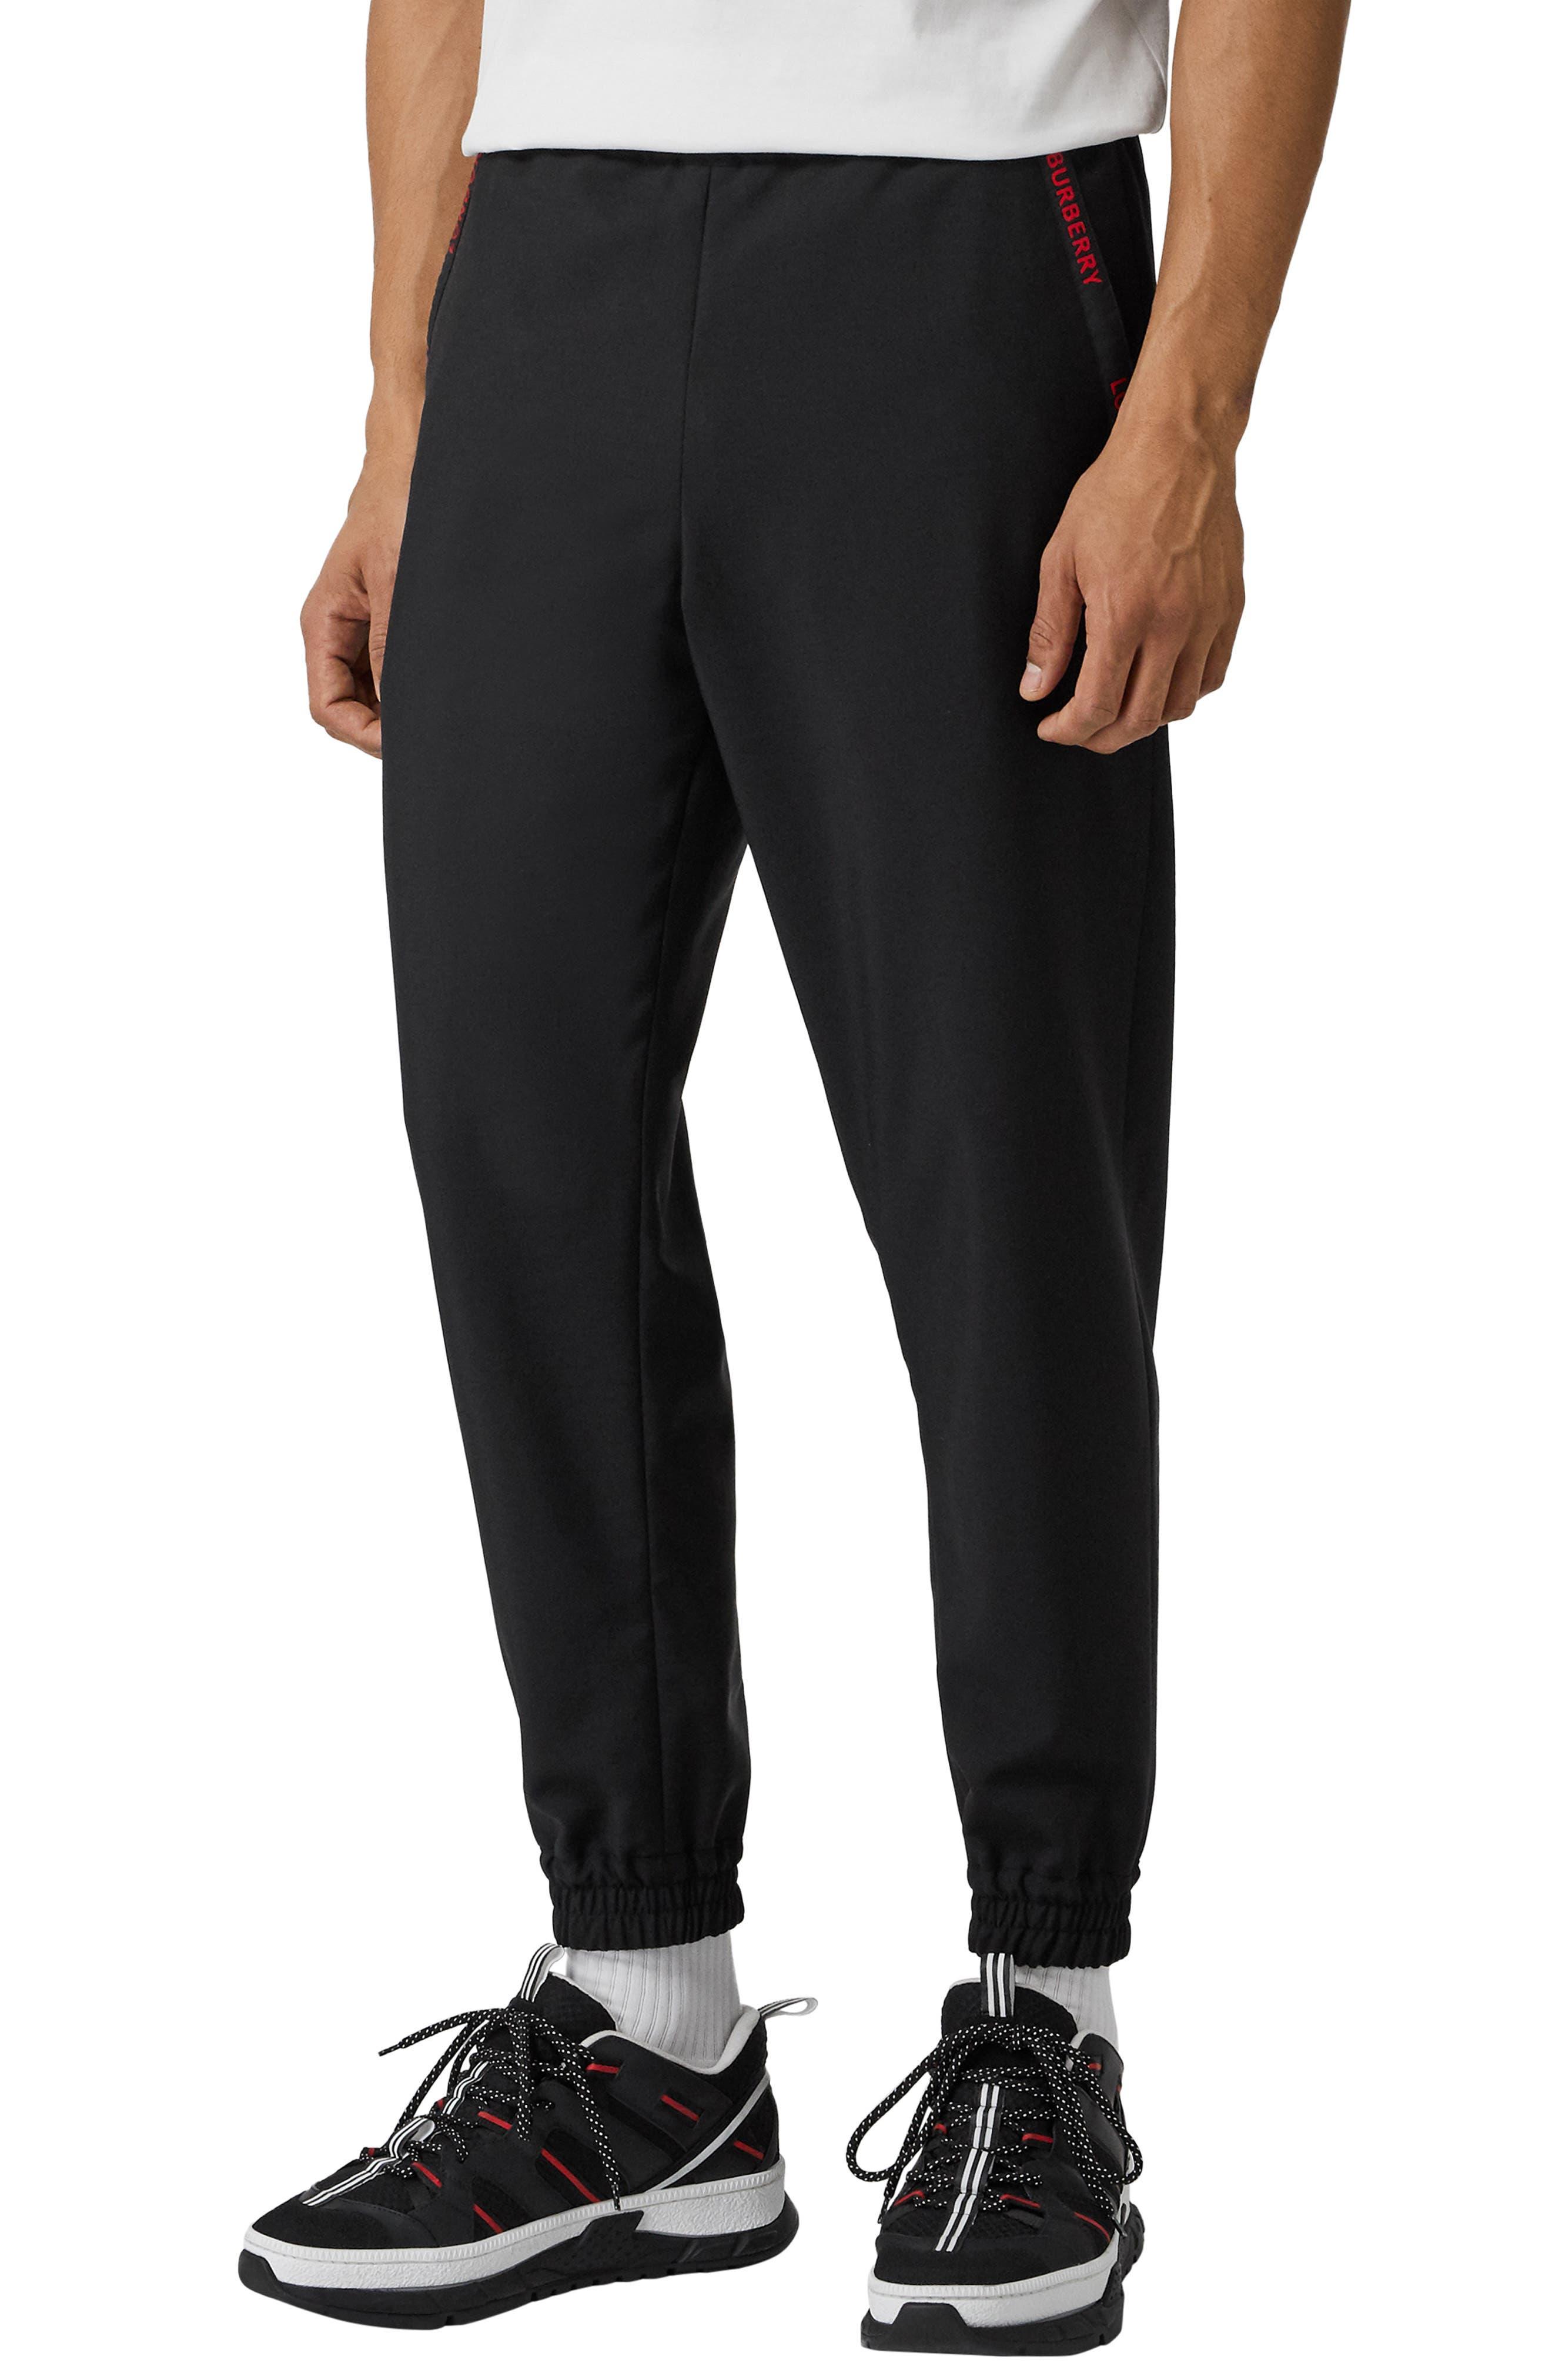 Burberry Block Wool & Mohair Slim Fit Sweatpants, Black